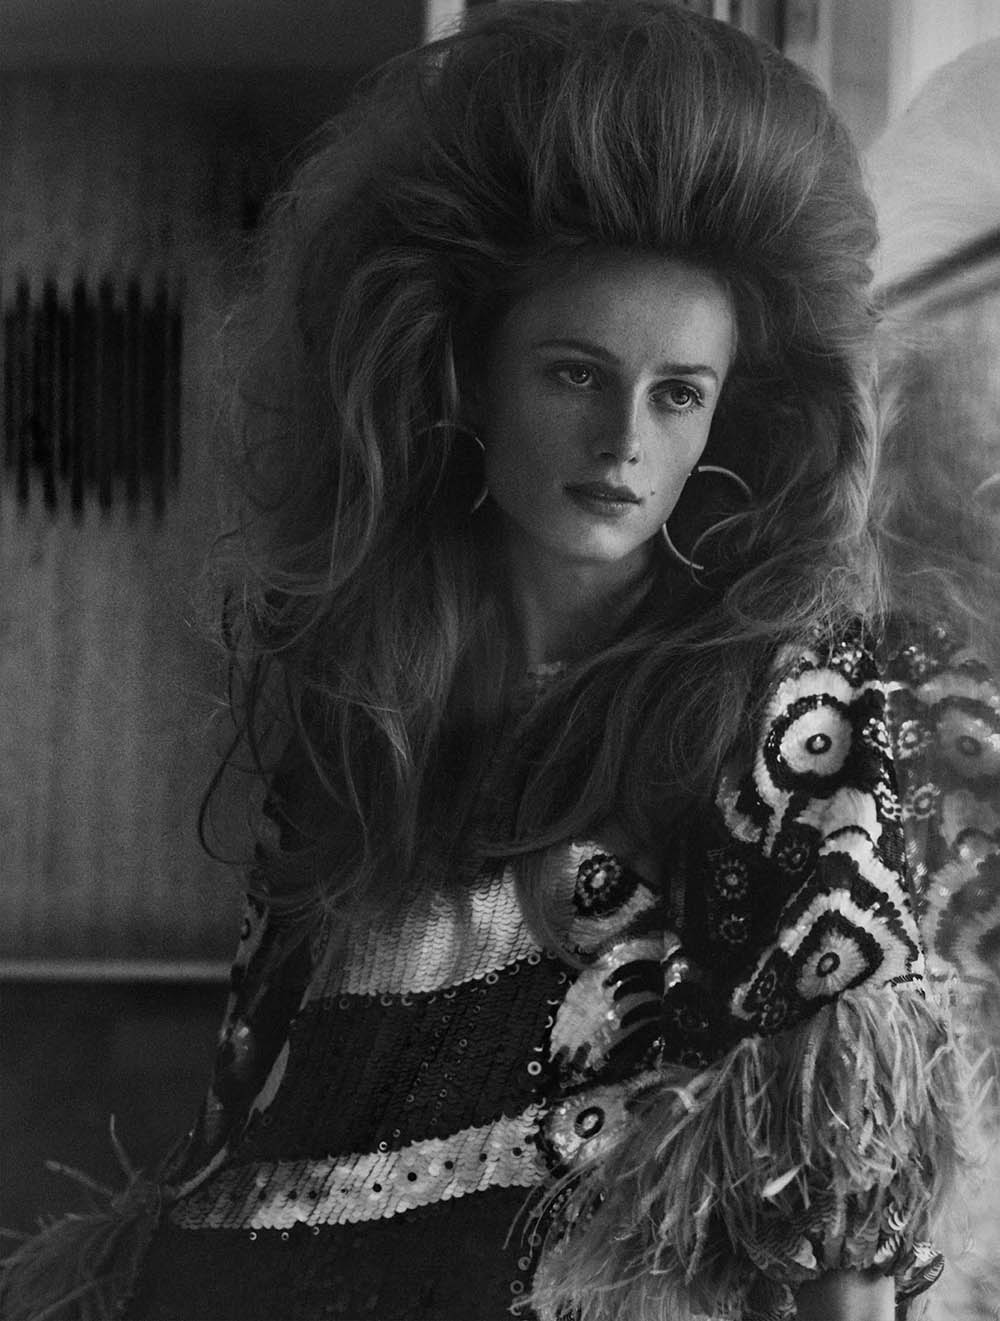 Rianne van Rompaey by Craig McDean for W Magazine Volume 2 2019